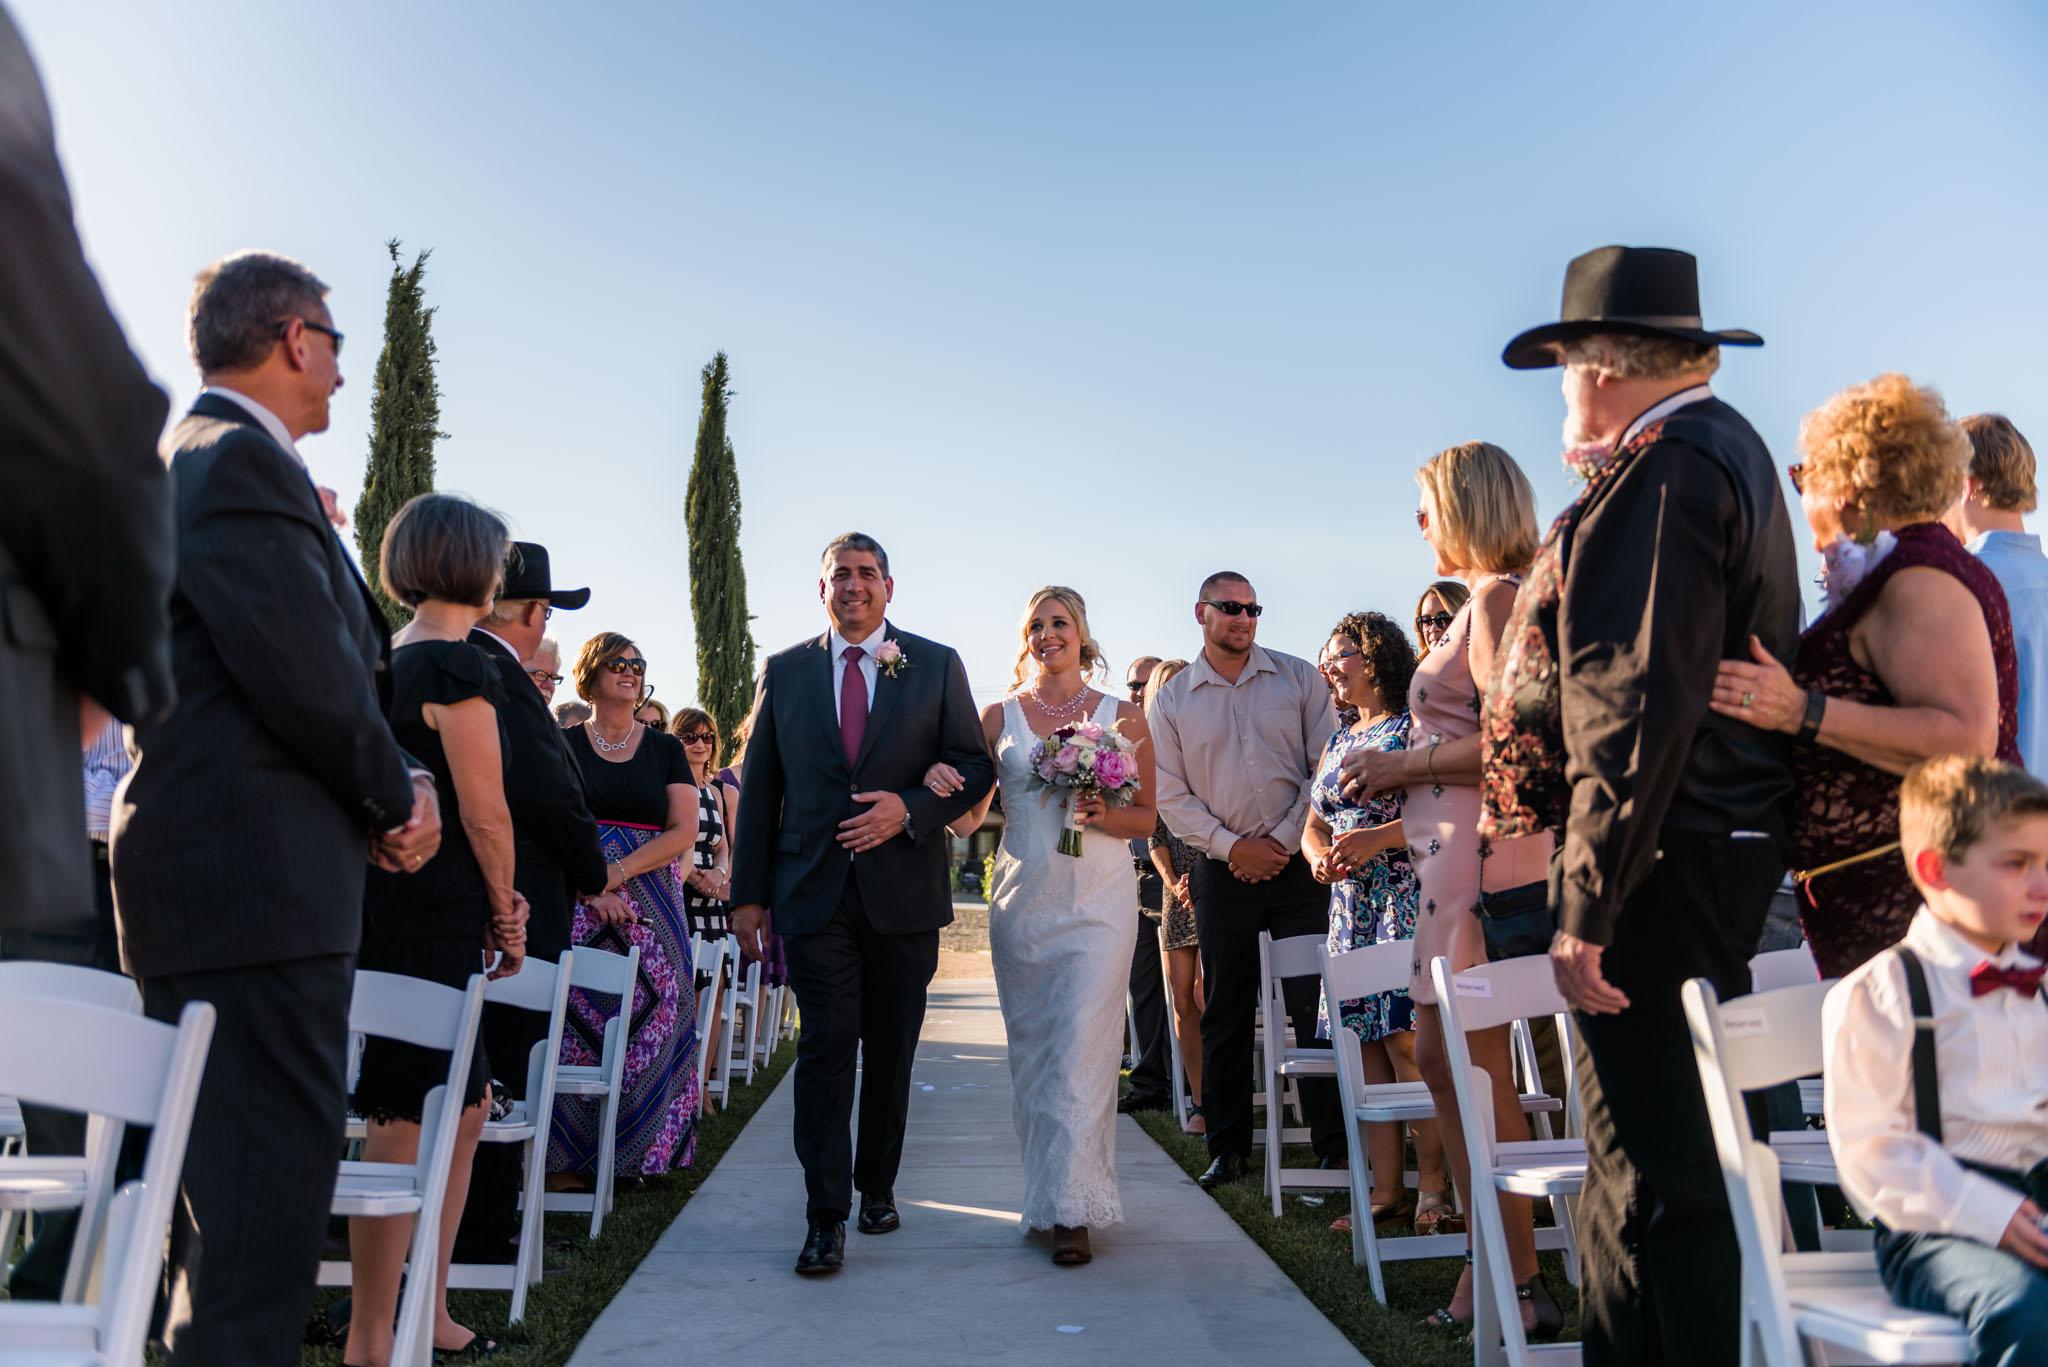 Avensole-Winery-Temecula-Wedding-Josh-and-Olivia-3484.JPG